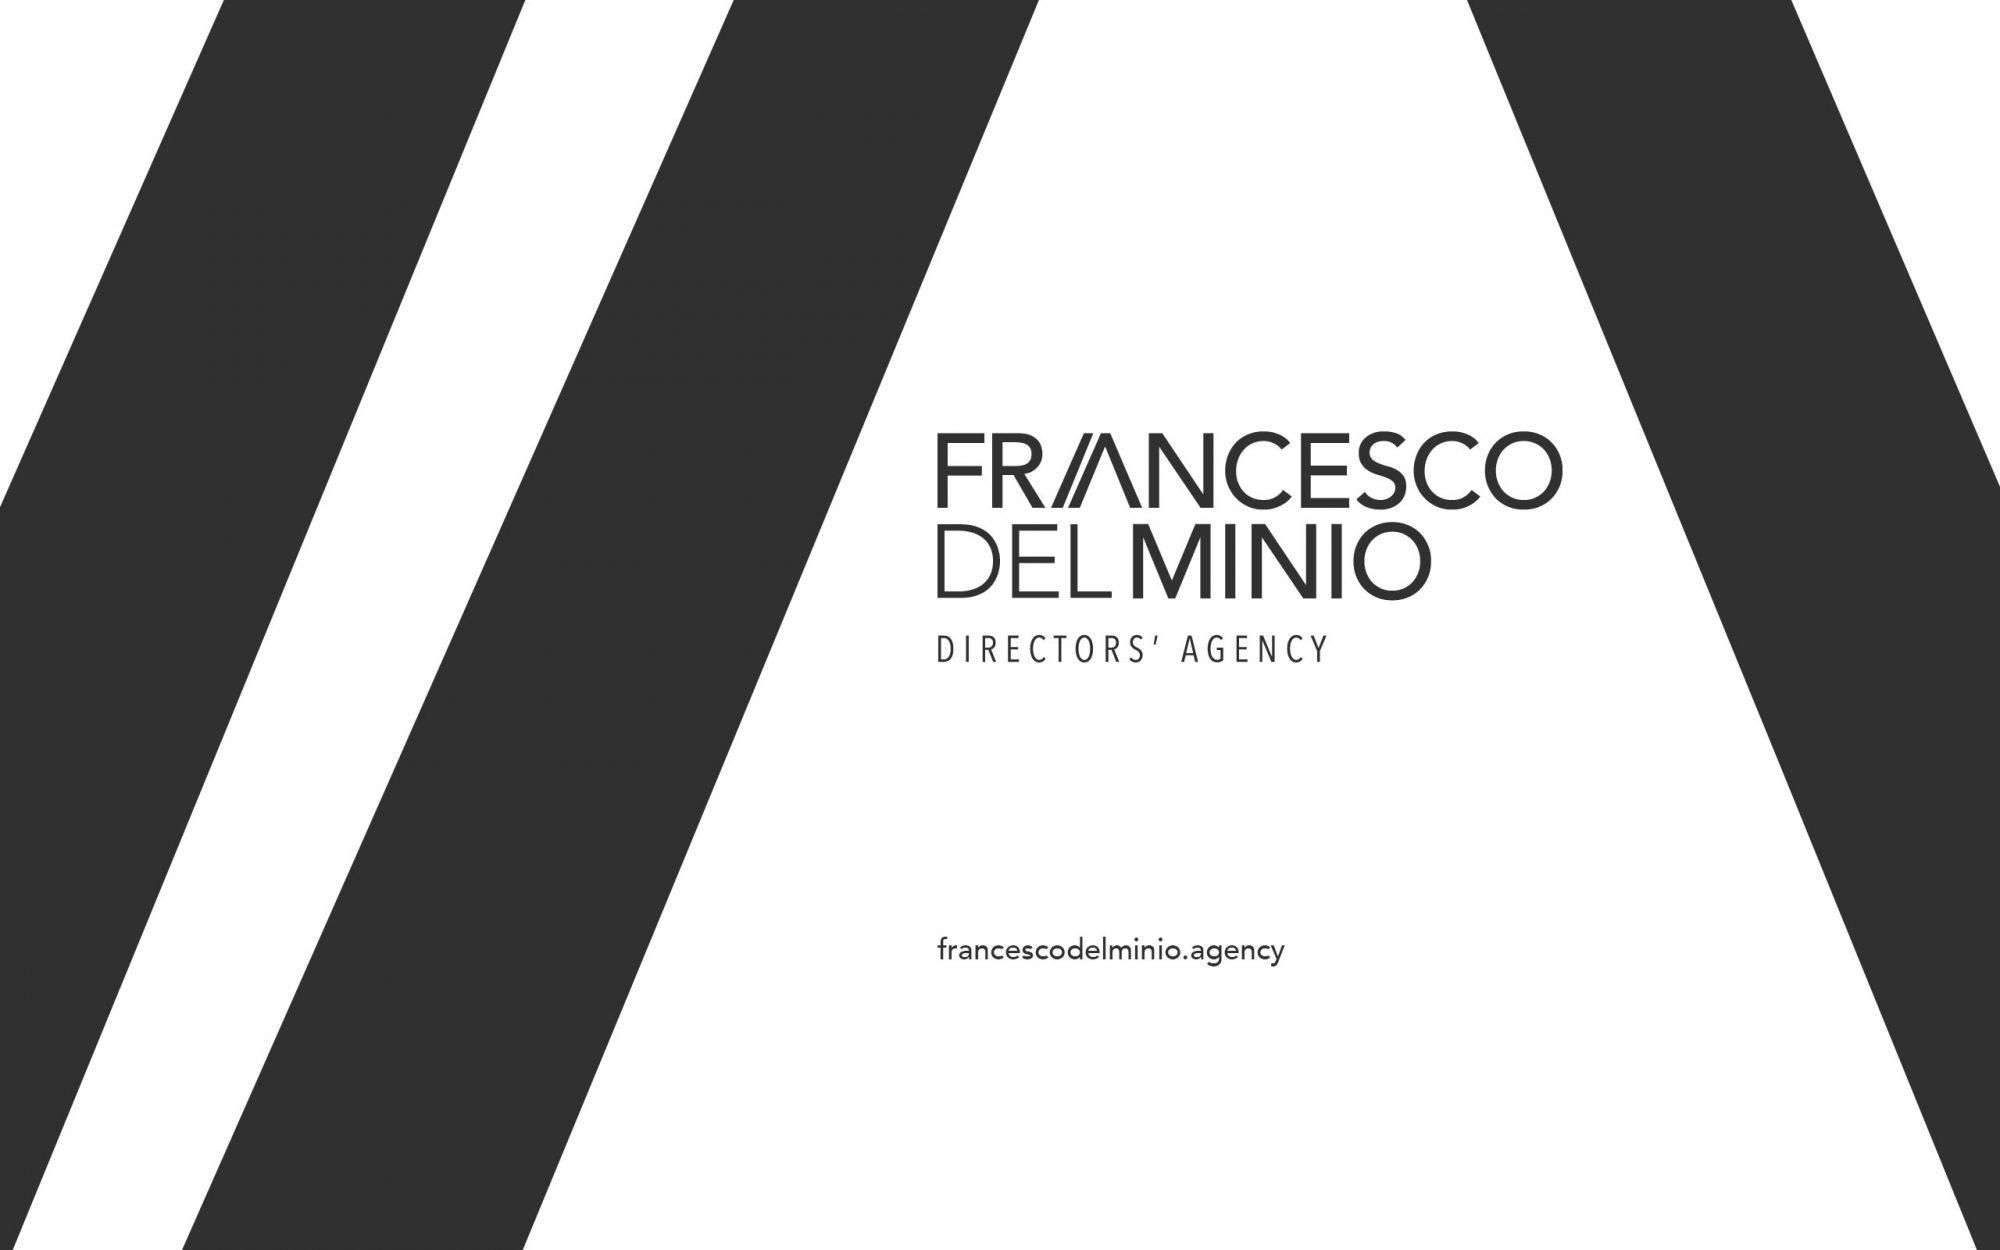 https://robertotunon.com/wp-content/uploads/2017/05/francescodelminio_wetransfer-bg_02.jpgFrancesco Del Minio